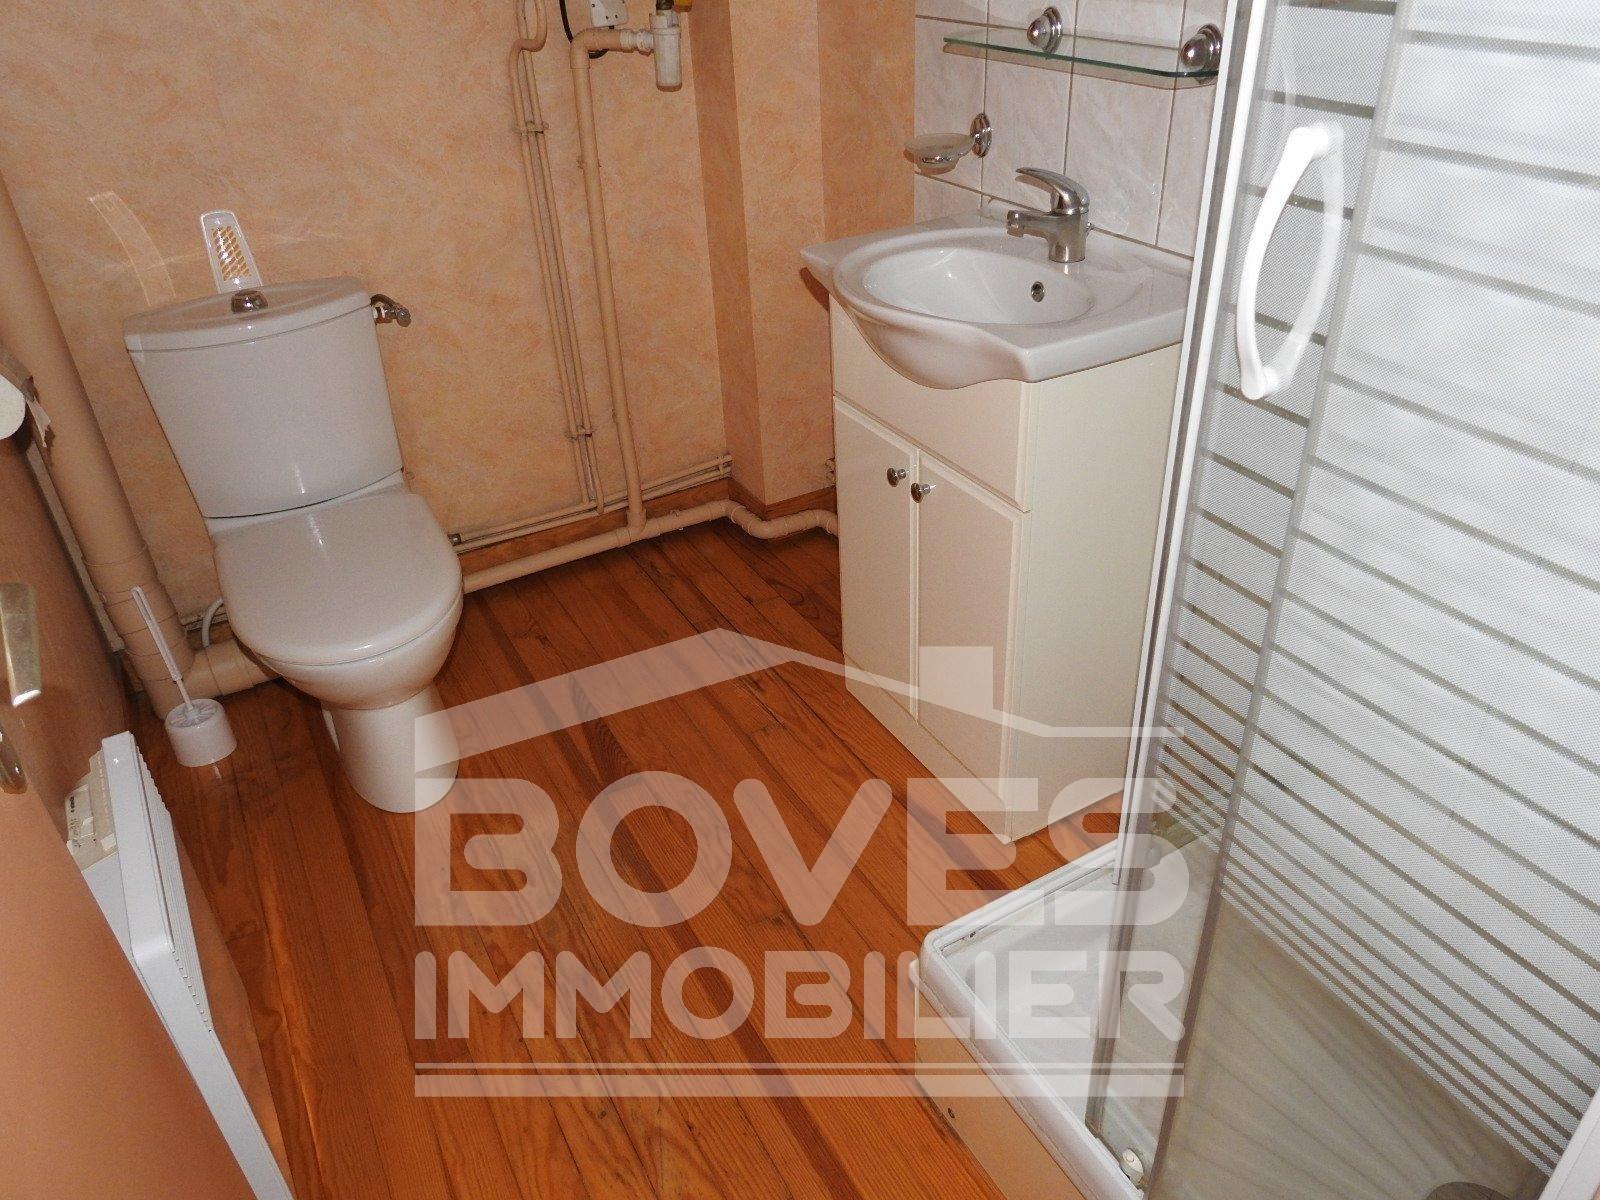 Appartement DUPLEX T1 80440 BOVES